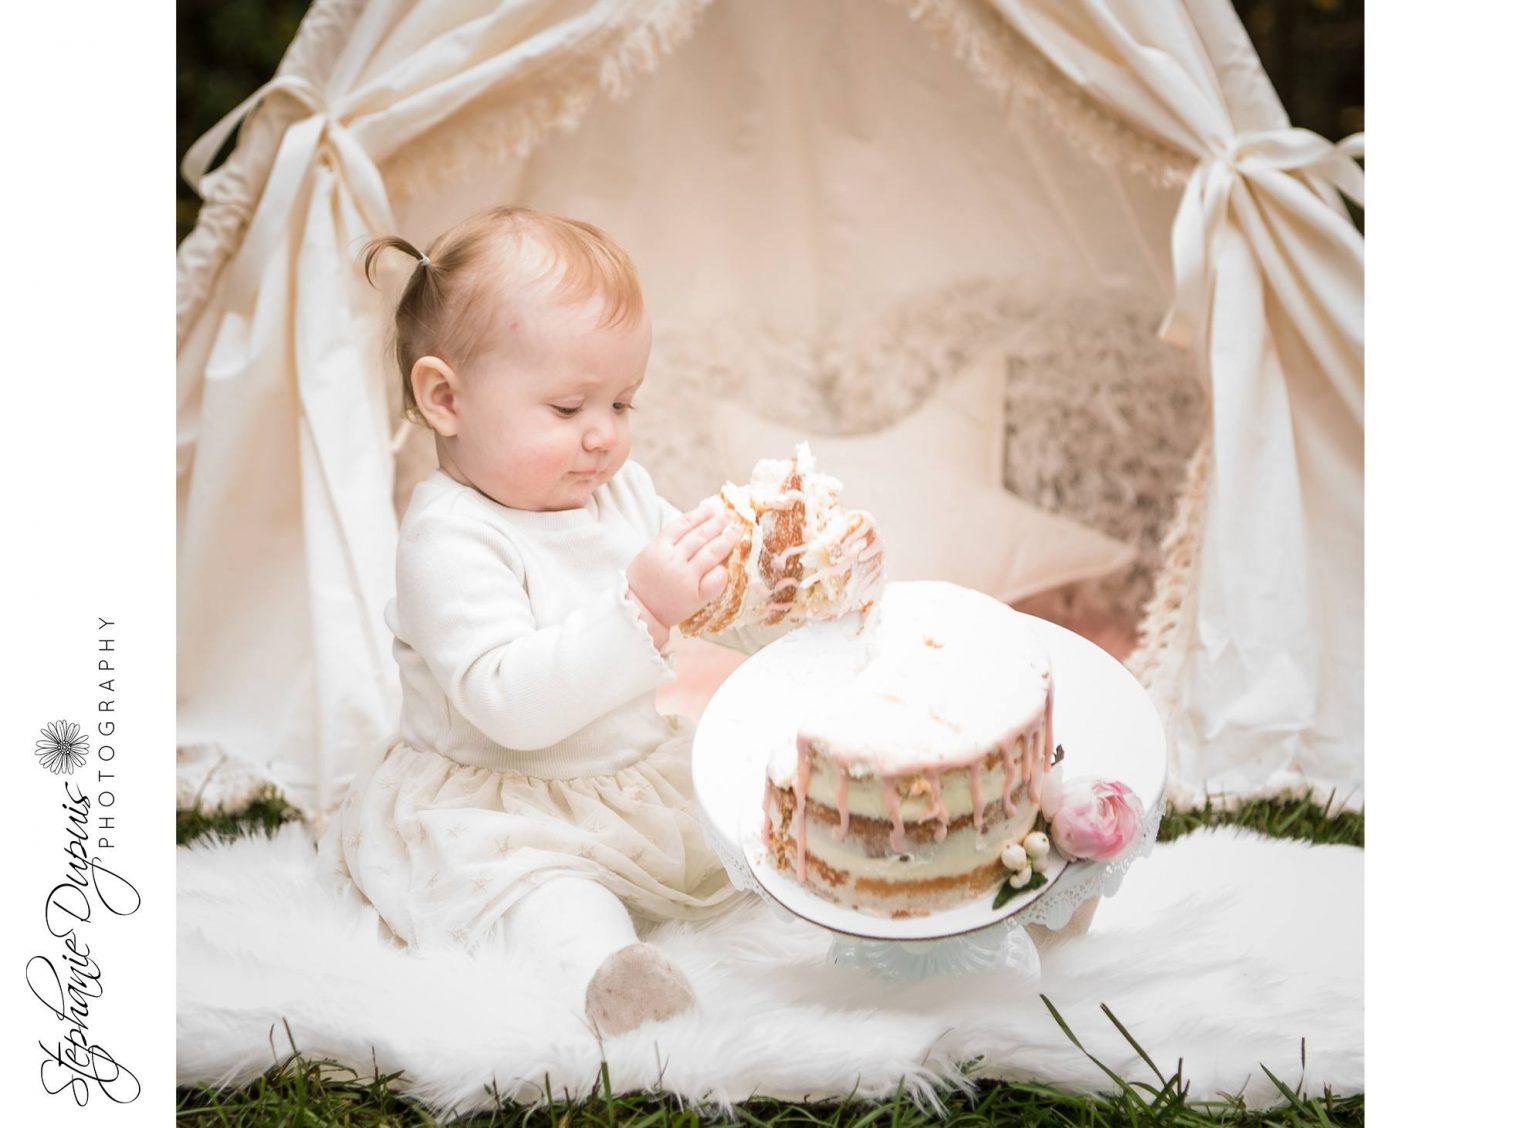 bromley cake smash 8 1536x1128 - Portfolio: Laura Mae Cake Smash